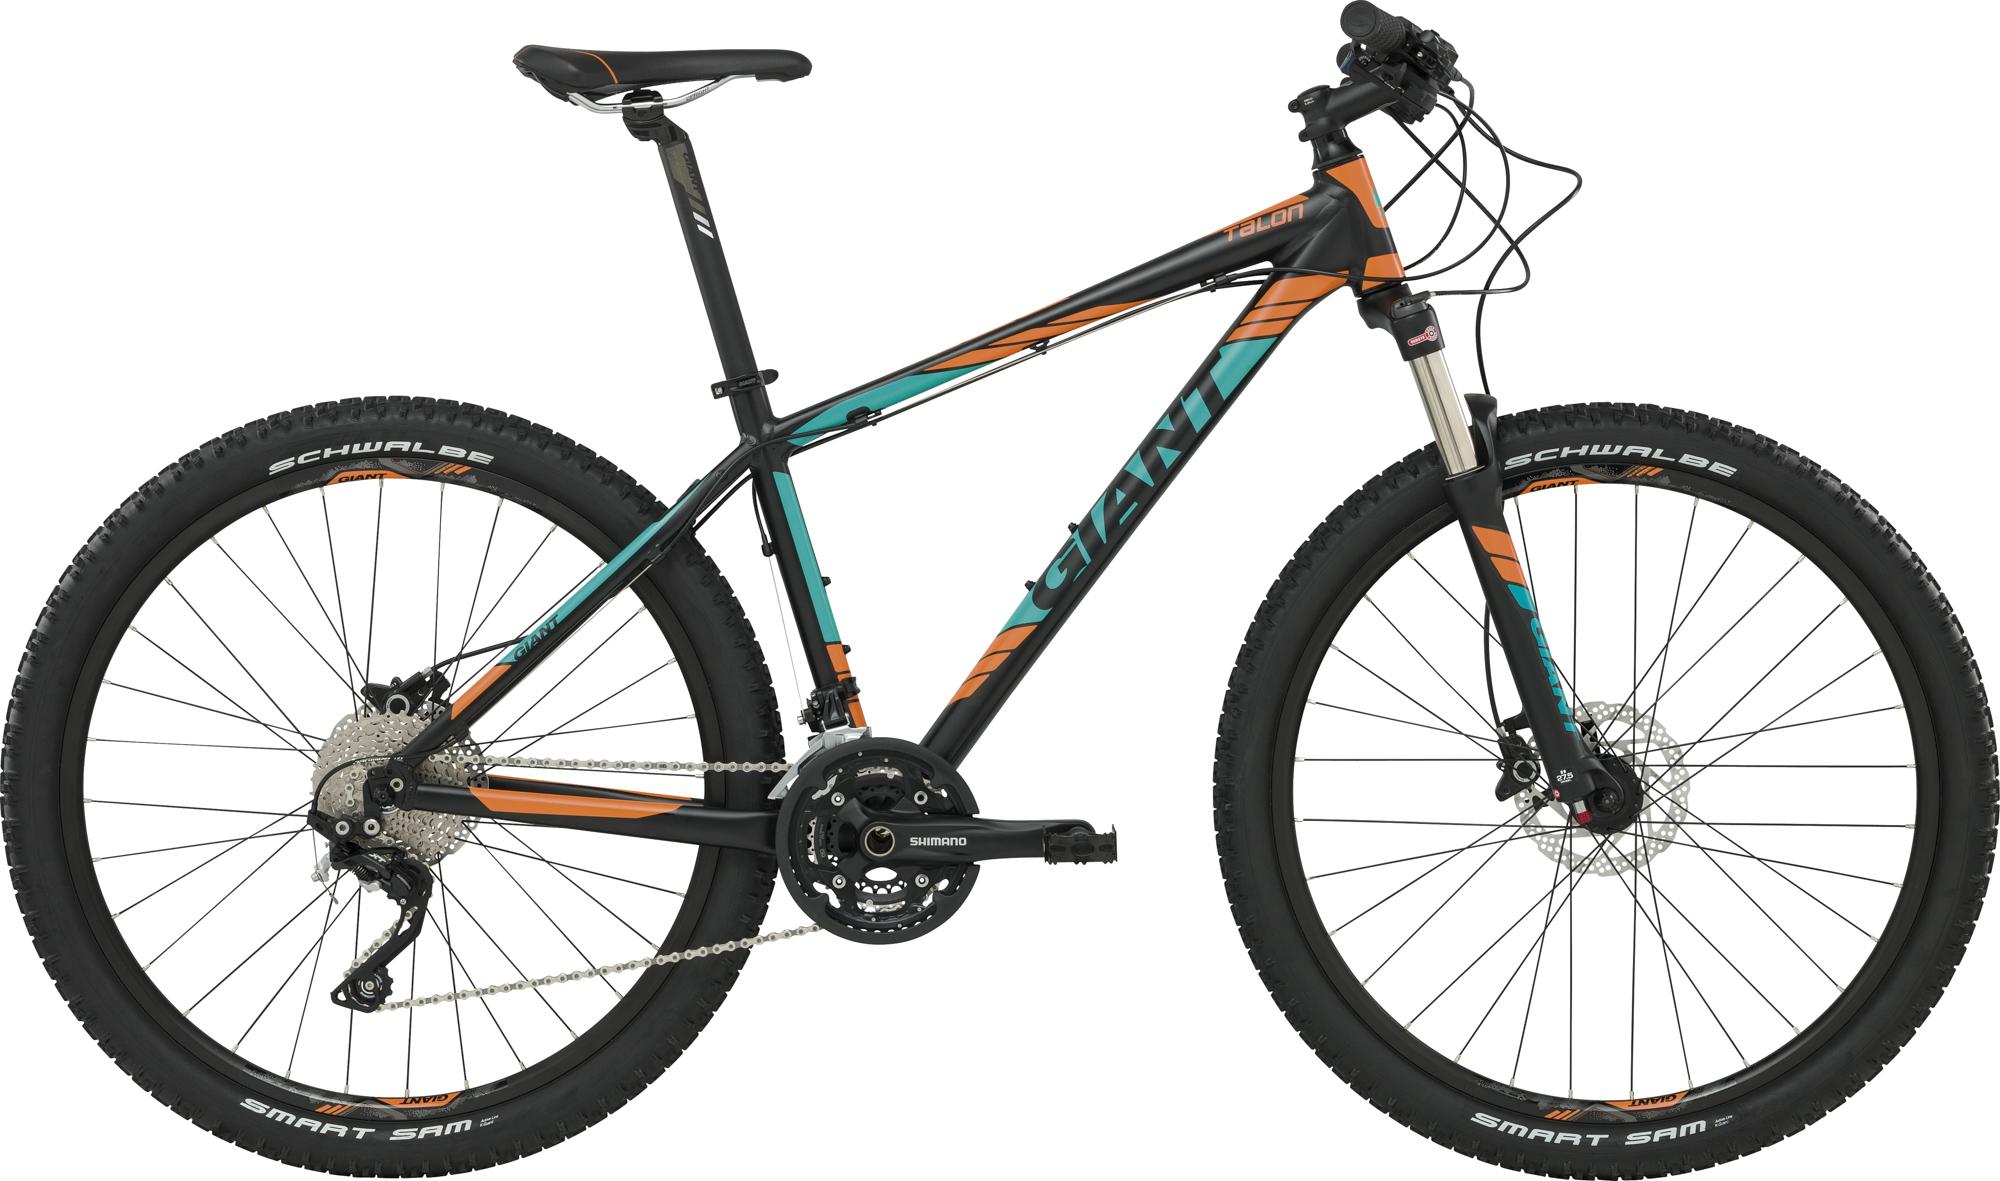 "Велосипед Talon 27.5 2 LTD Колесо:27,5"" Рама:L Цвет:Черный/Оранж от Ravta"